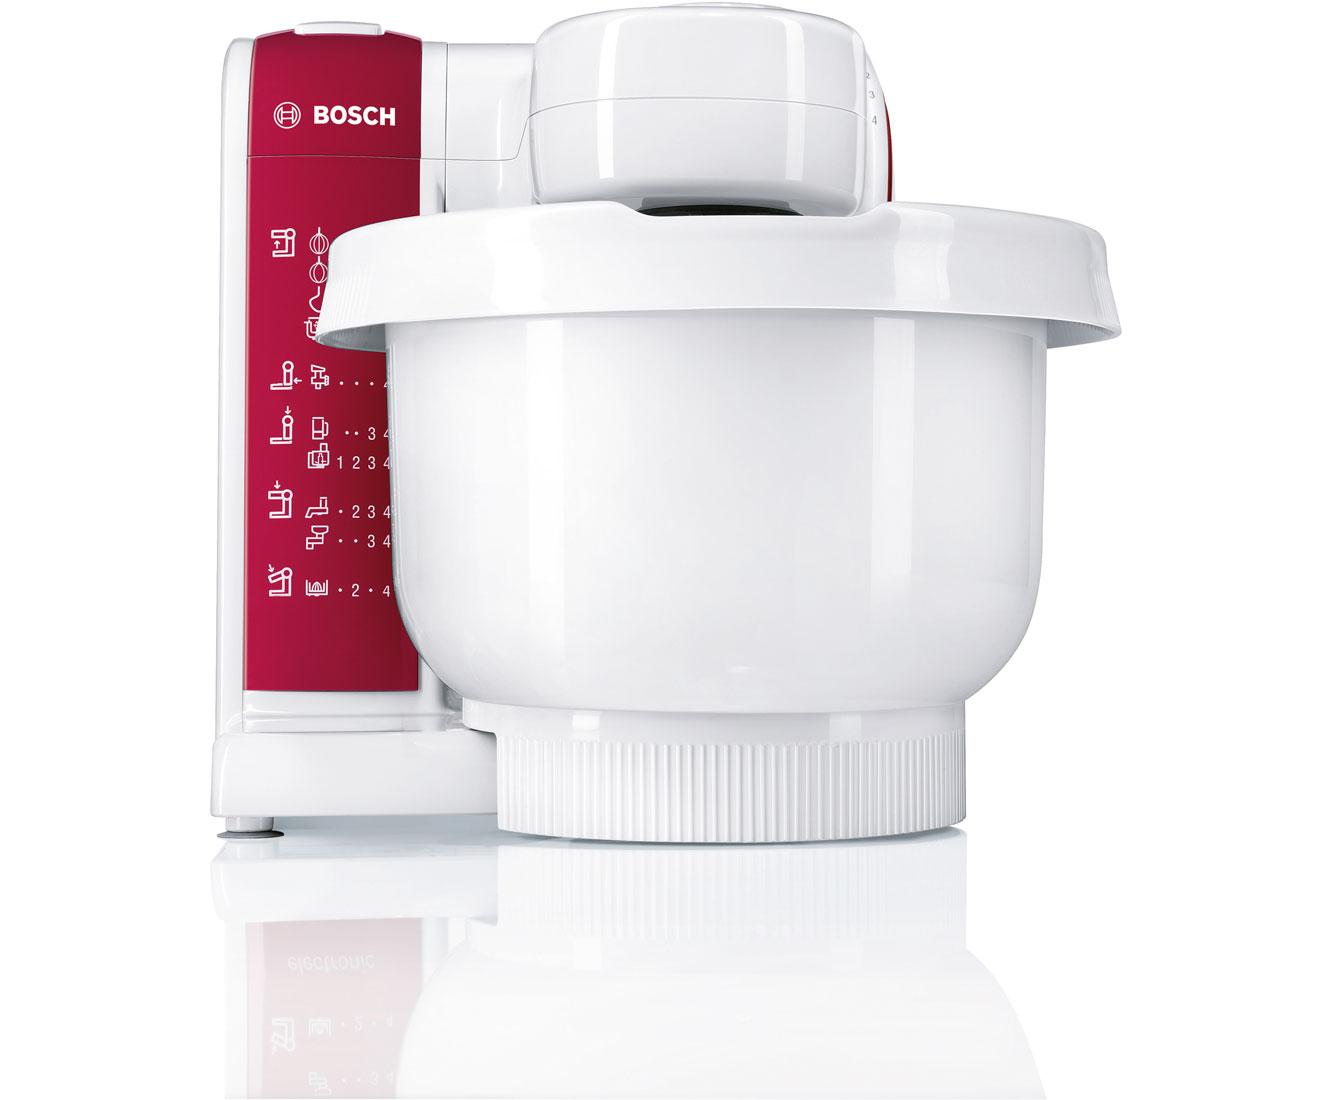 Bosch MUM48010DE Küchenmaschinen - Weiss / Rot | Küche und Esszimmer > Küchengeräte > Rührgeräte und Mixer | Weiss - Rot | Bosch